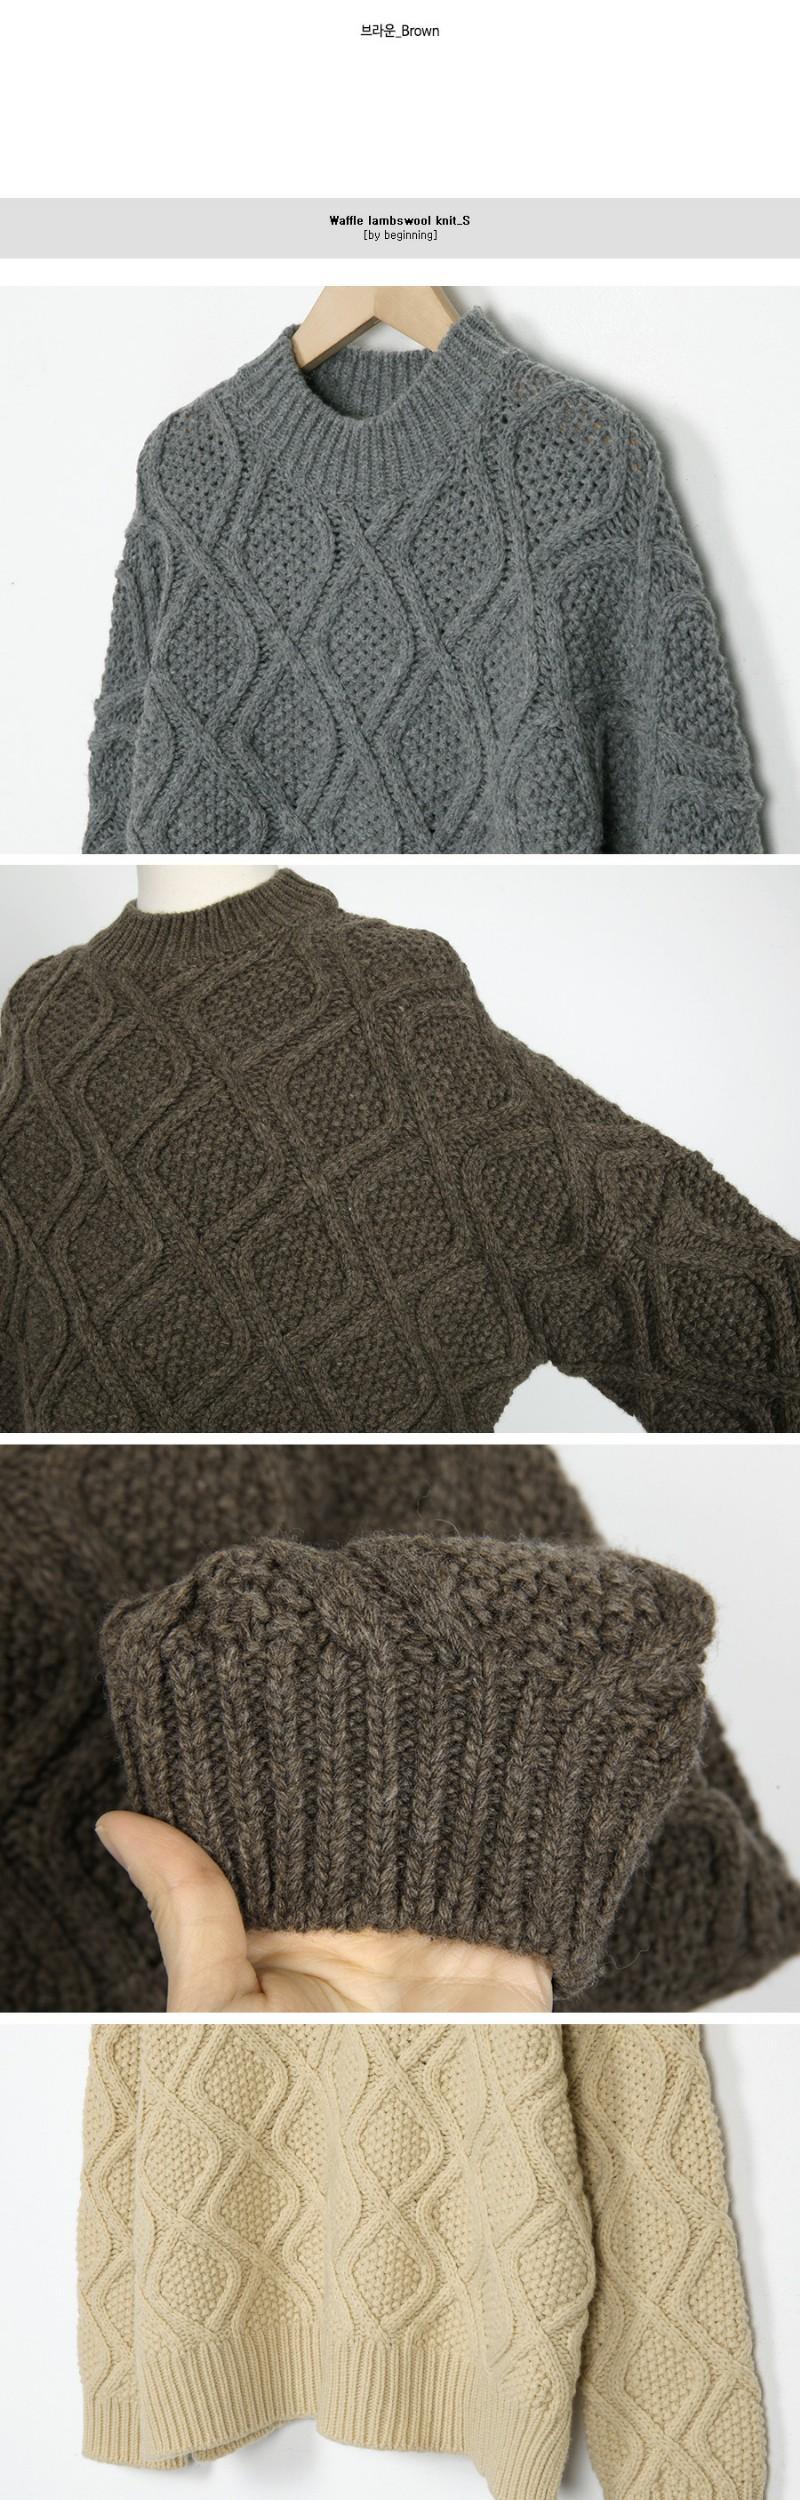 Waffle lambswool knit_S (size : free)